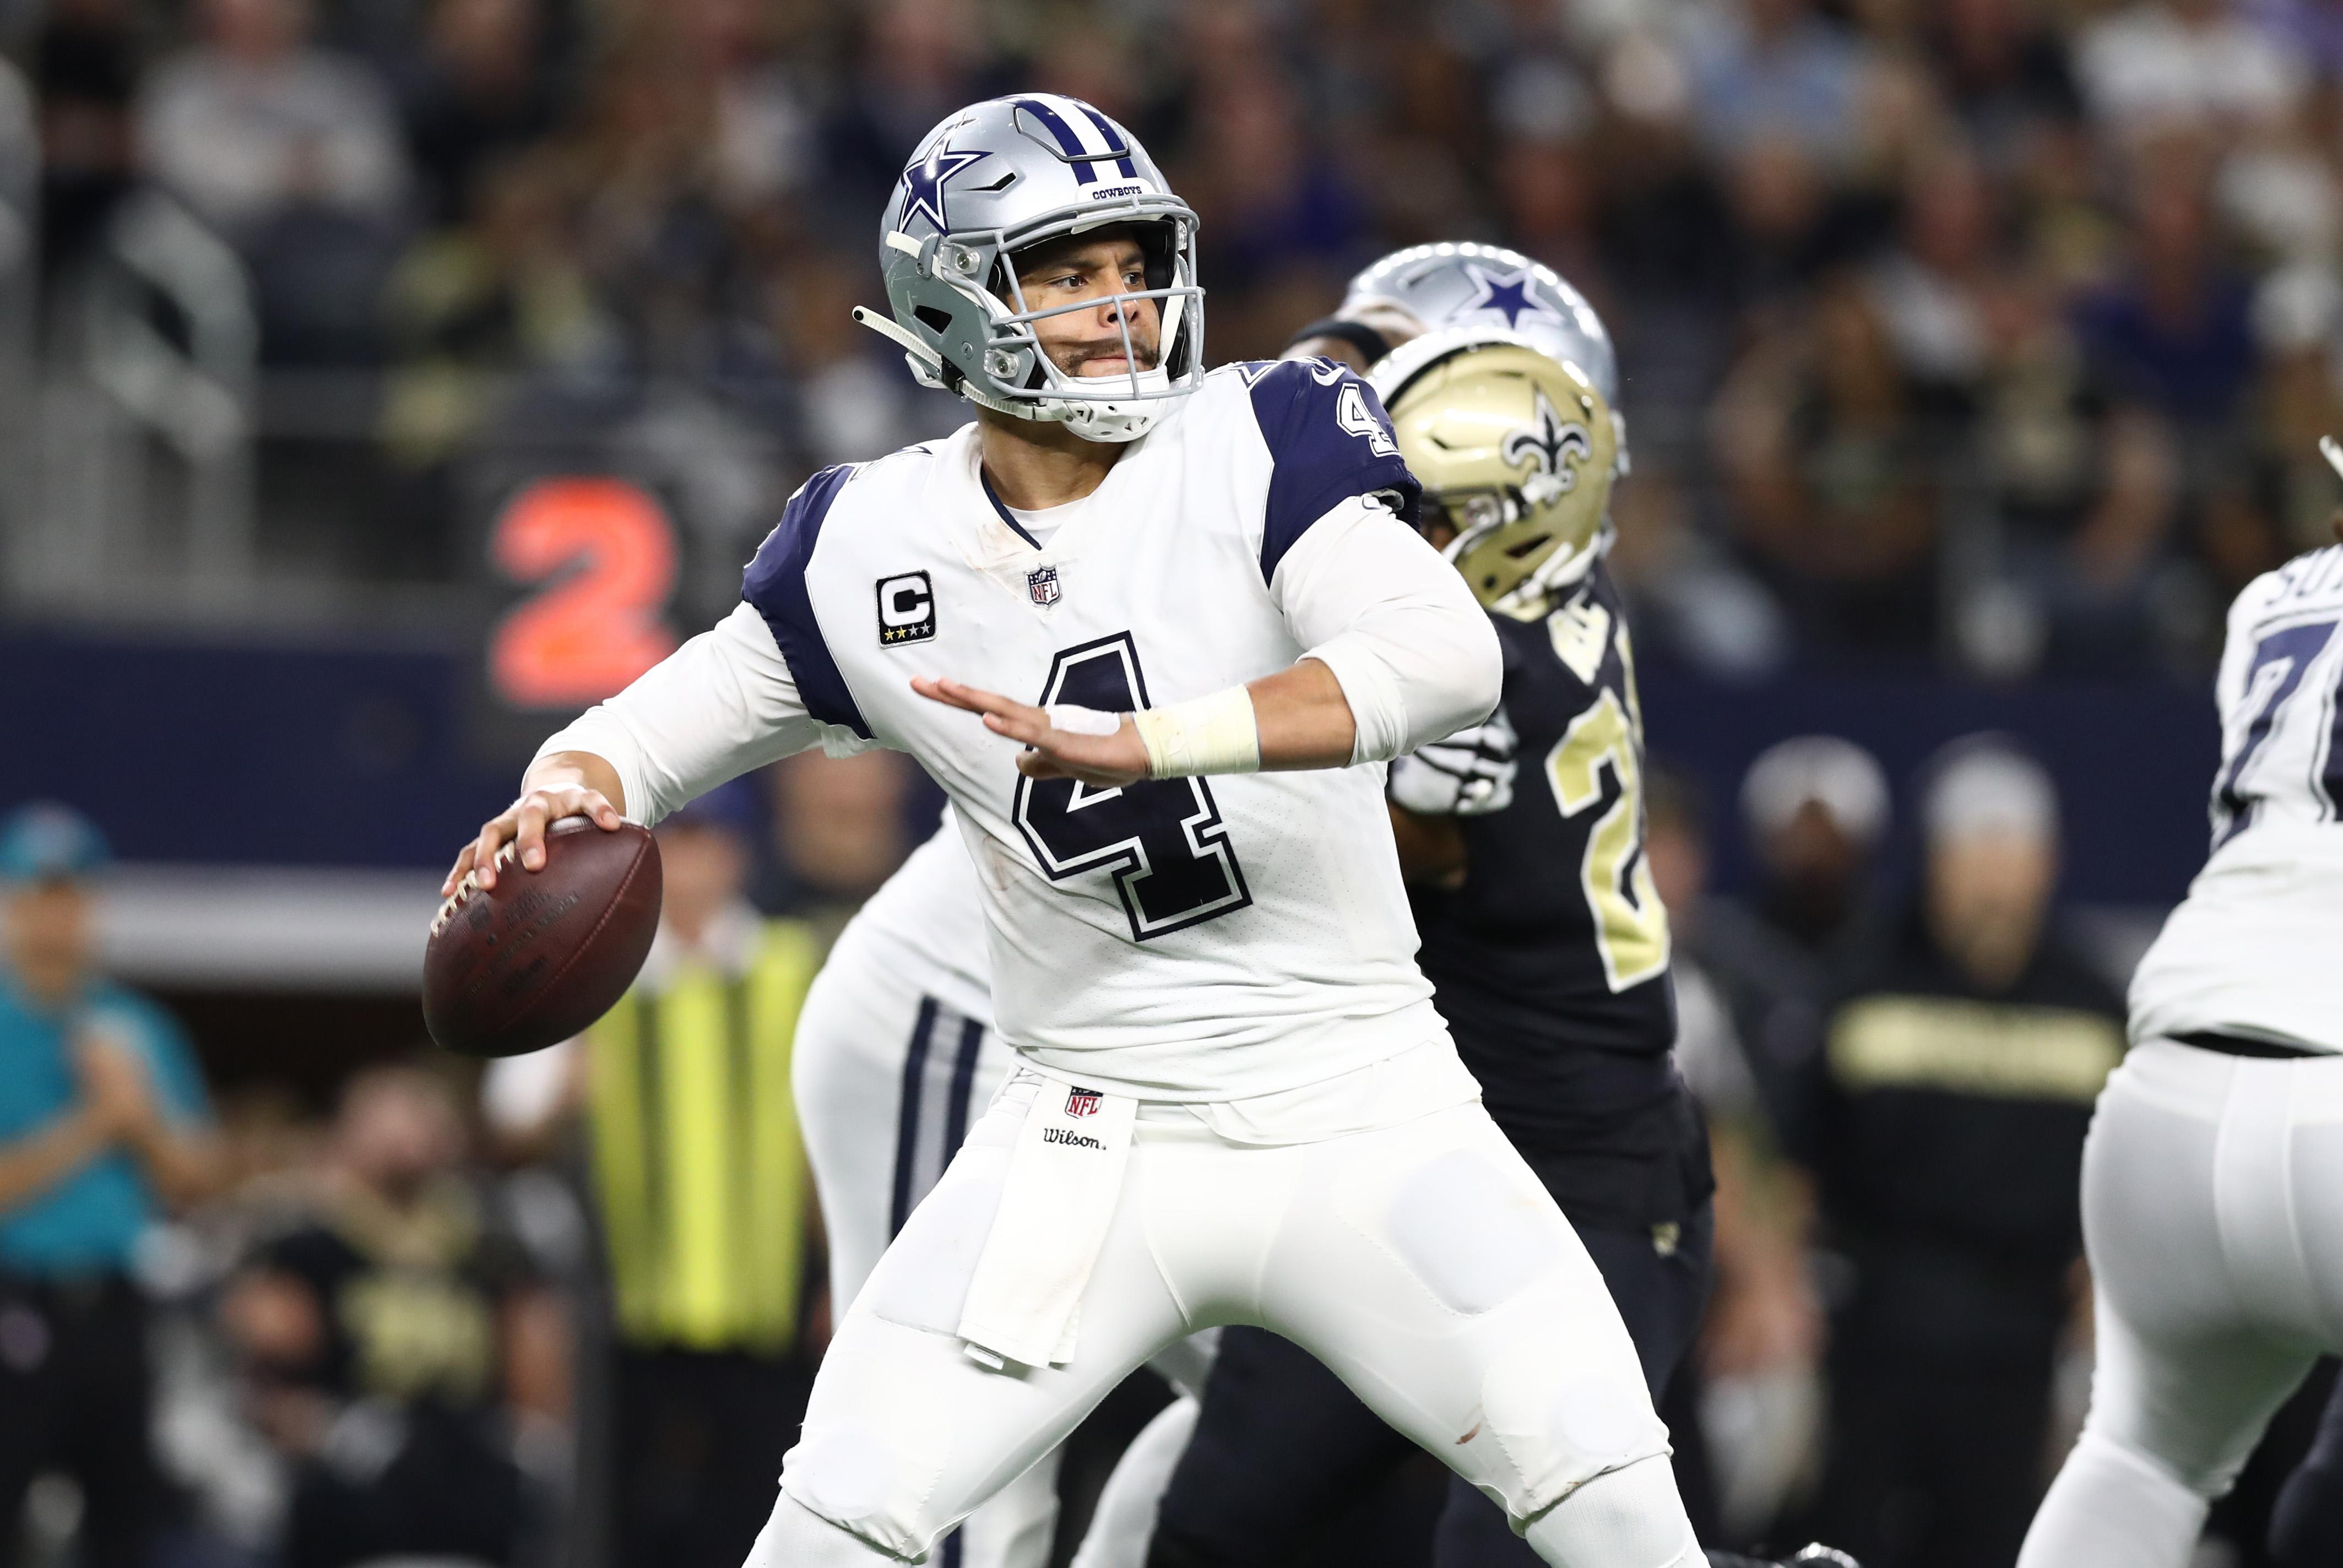 How Fair Are ESPN's 'Top 5' Criticisms of The Cowboys? Part 1: Dak Prescott